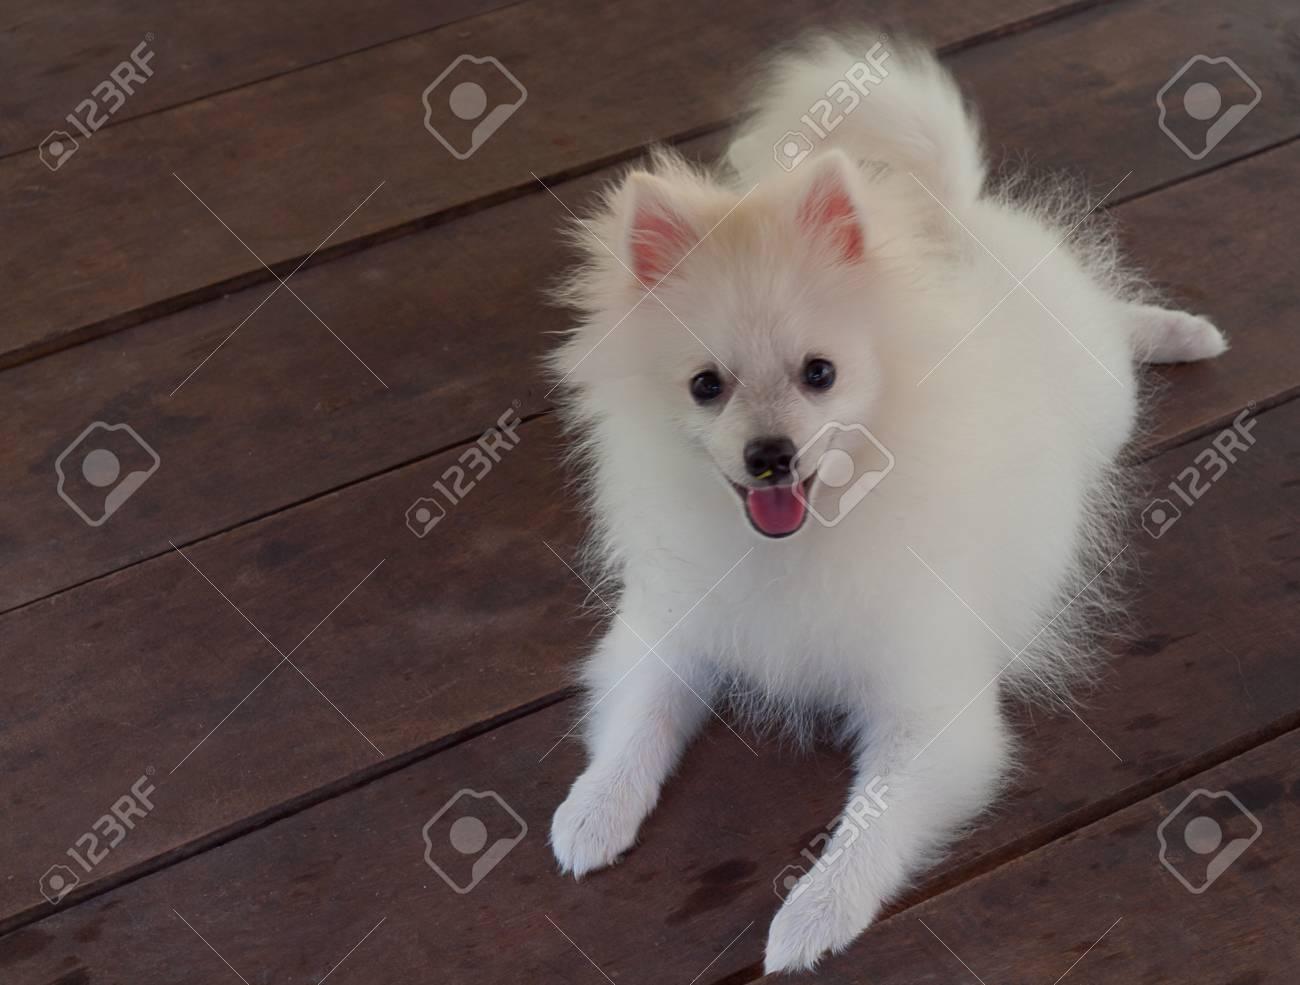 Dog Pomeranian Spitz Cute White Fluffy Beauty In Nature Stock